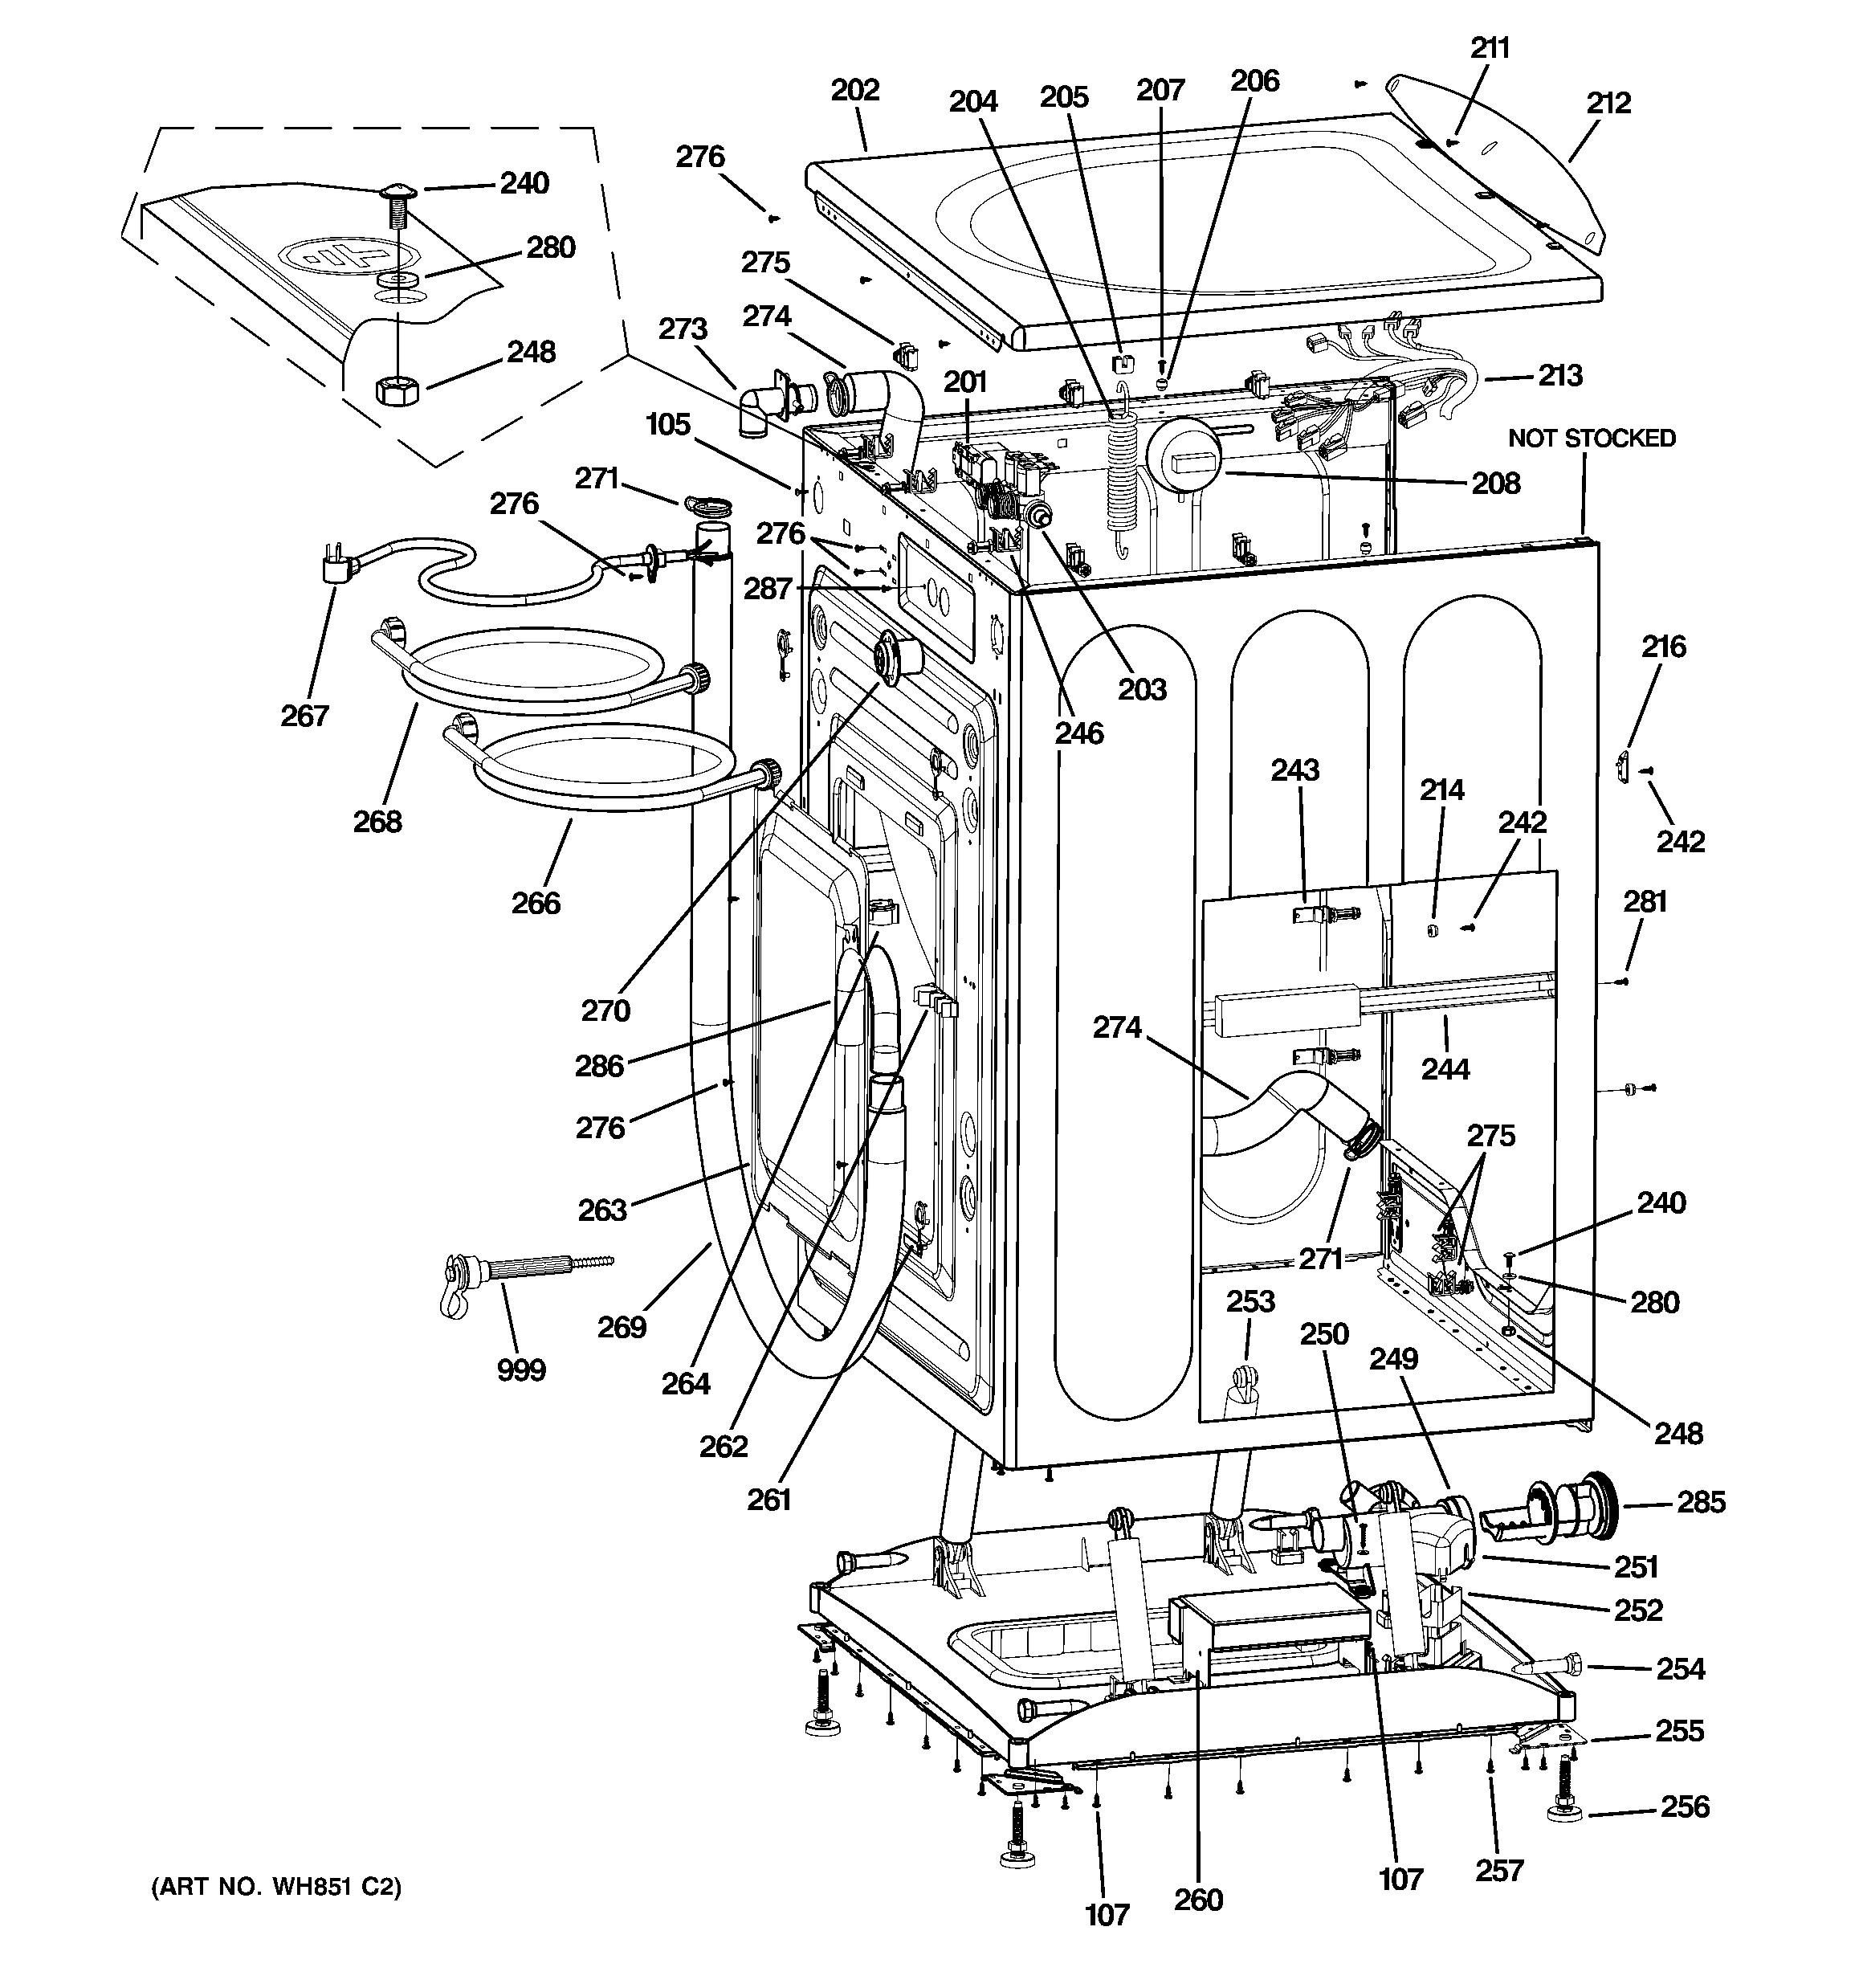 Ge Dishwasher Parts Diagram Ge Model Wcvh6400j0ww Residential Washers Genuine Parts Of Ge Dishwasher Parts Diagram